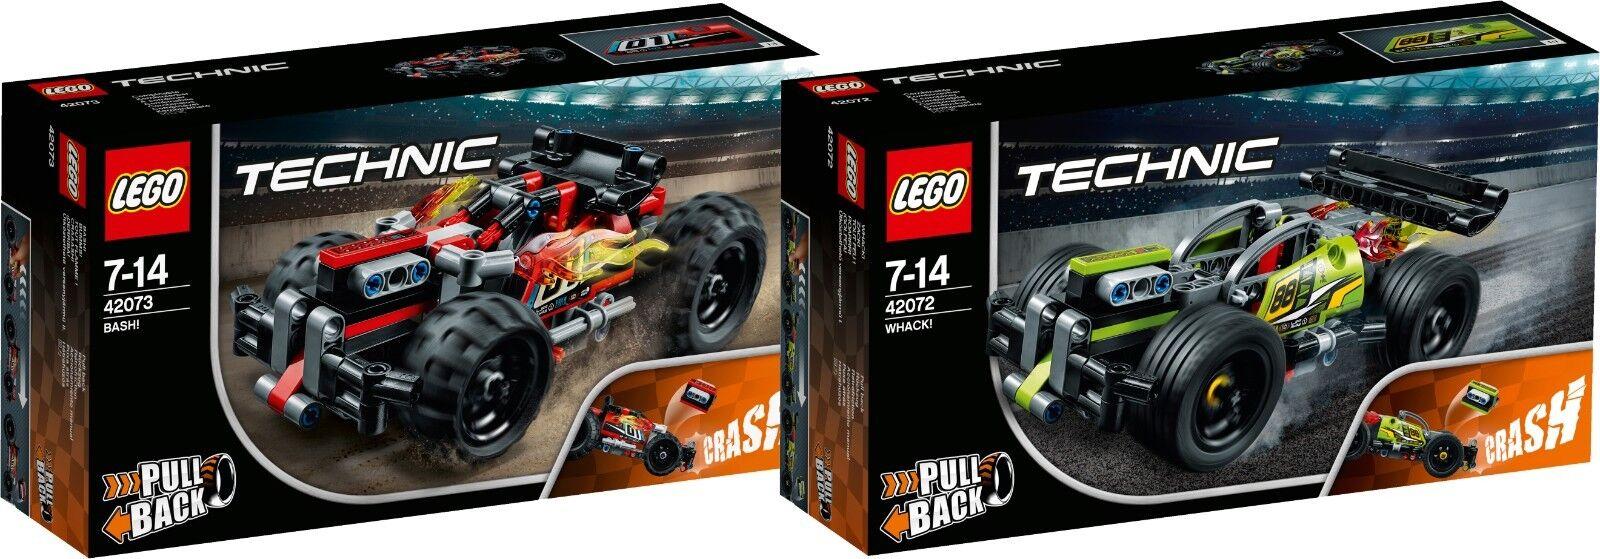 LEGO Technic 42073  + 42072 Z  TOUT FLAMME   BASH  ACK  TOUT FEU   WHACK  N1 18